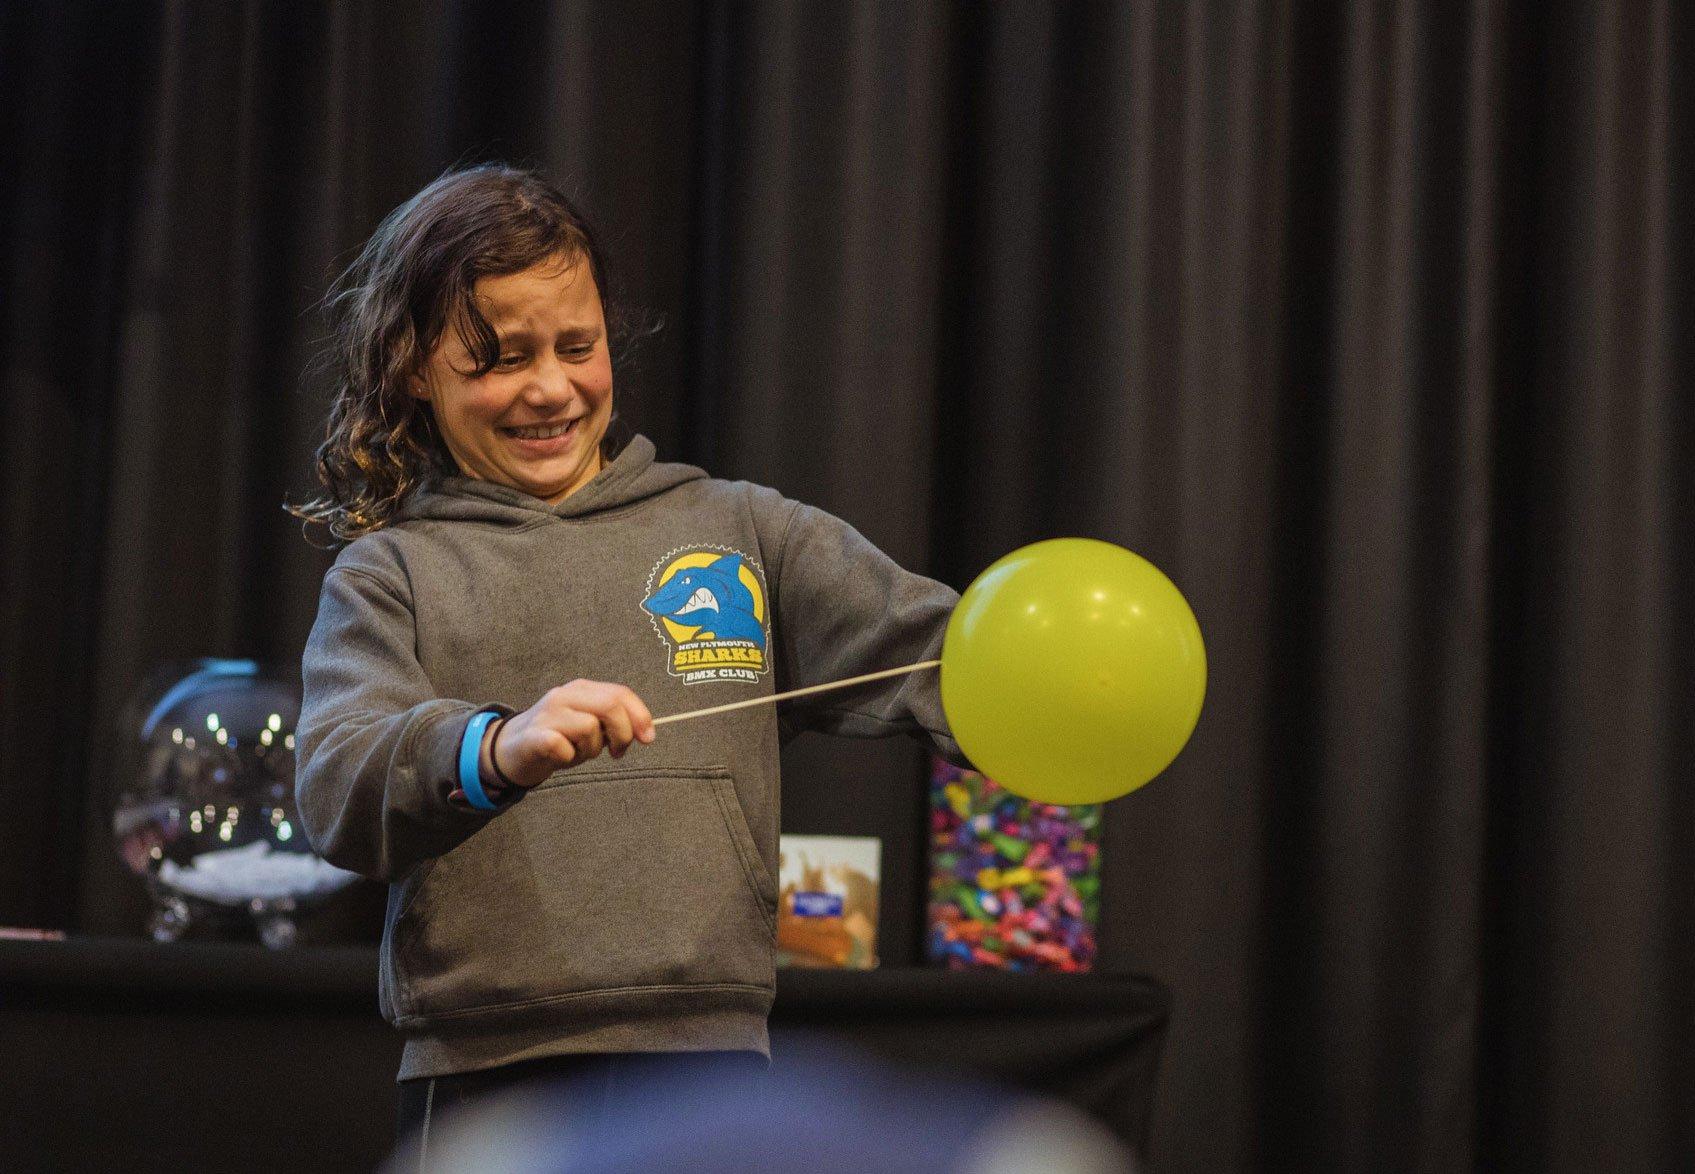 Child Playing with Superhero Science Sticks